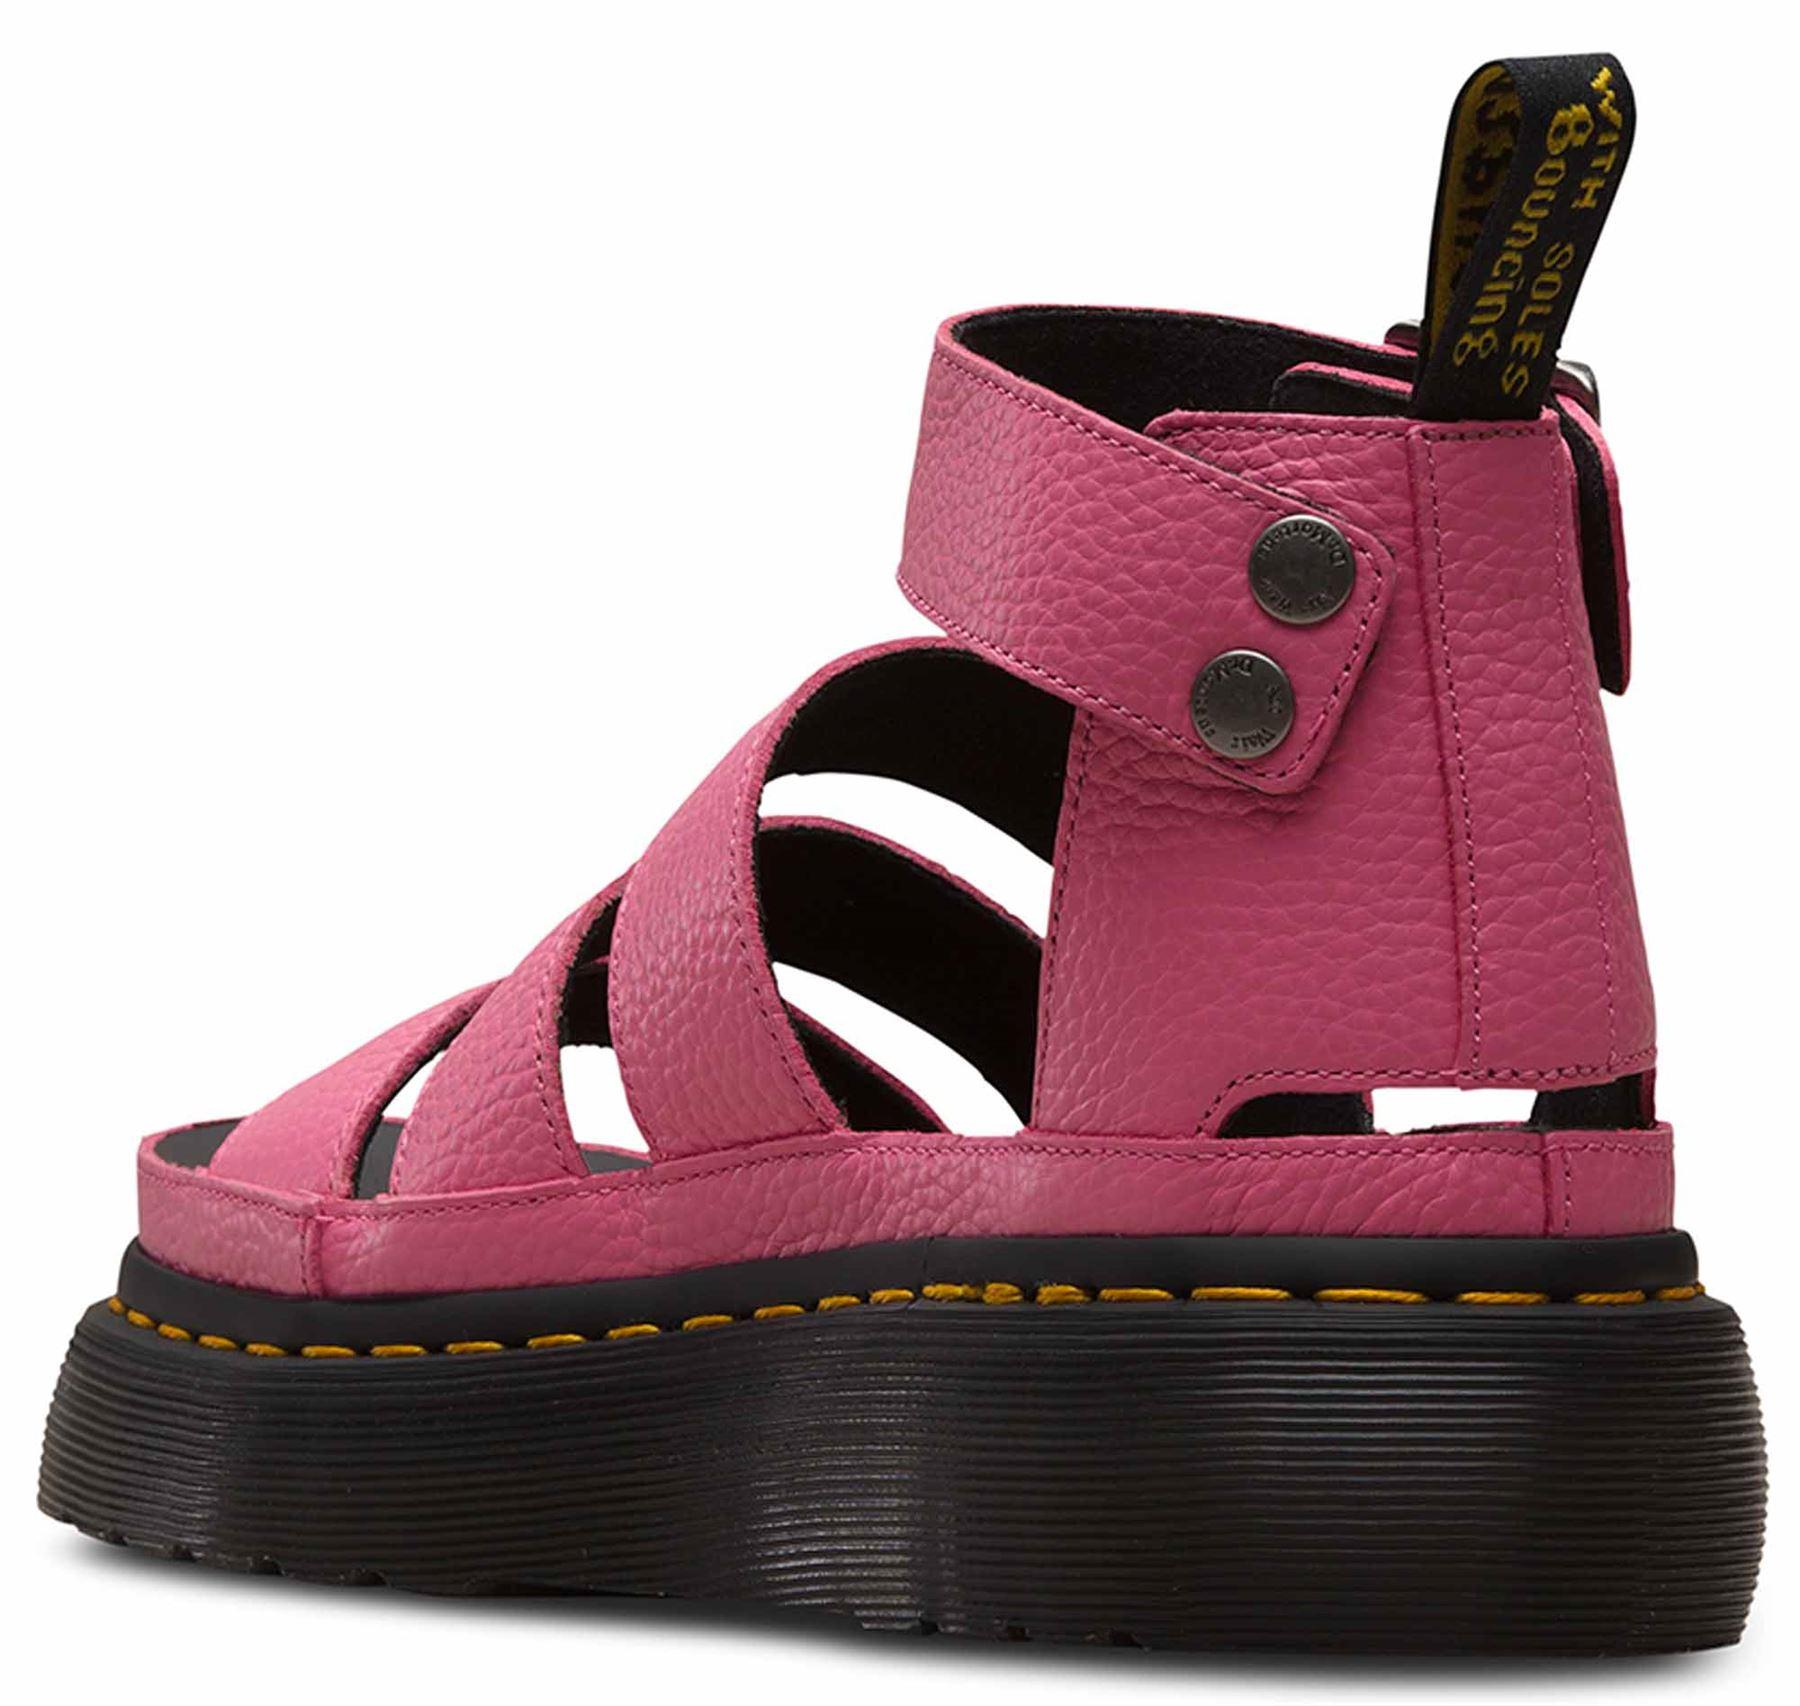 5ee2d7edc5fb Dr Martens Clarissa II Quad Soft Pink Aunt Sally Leather Gladiator ...